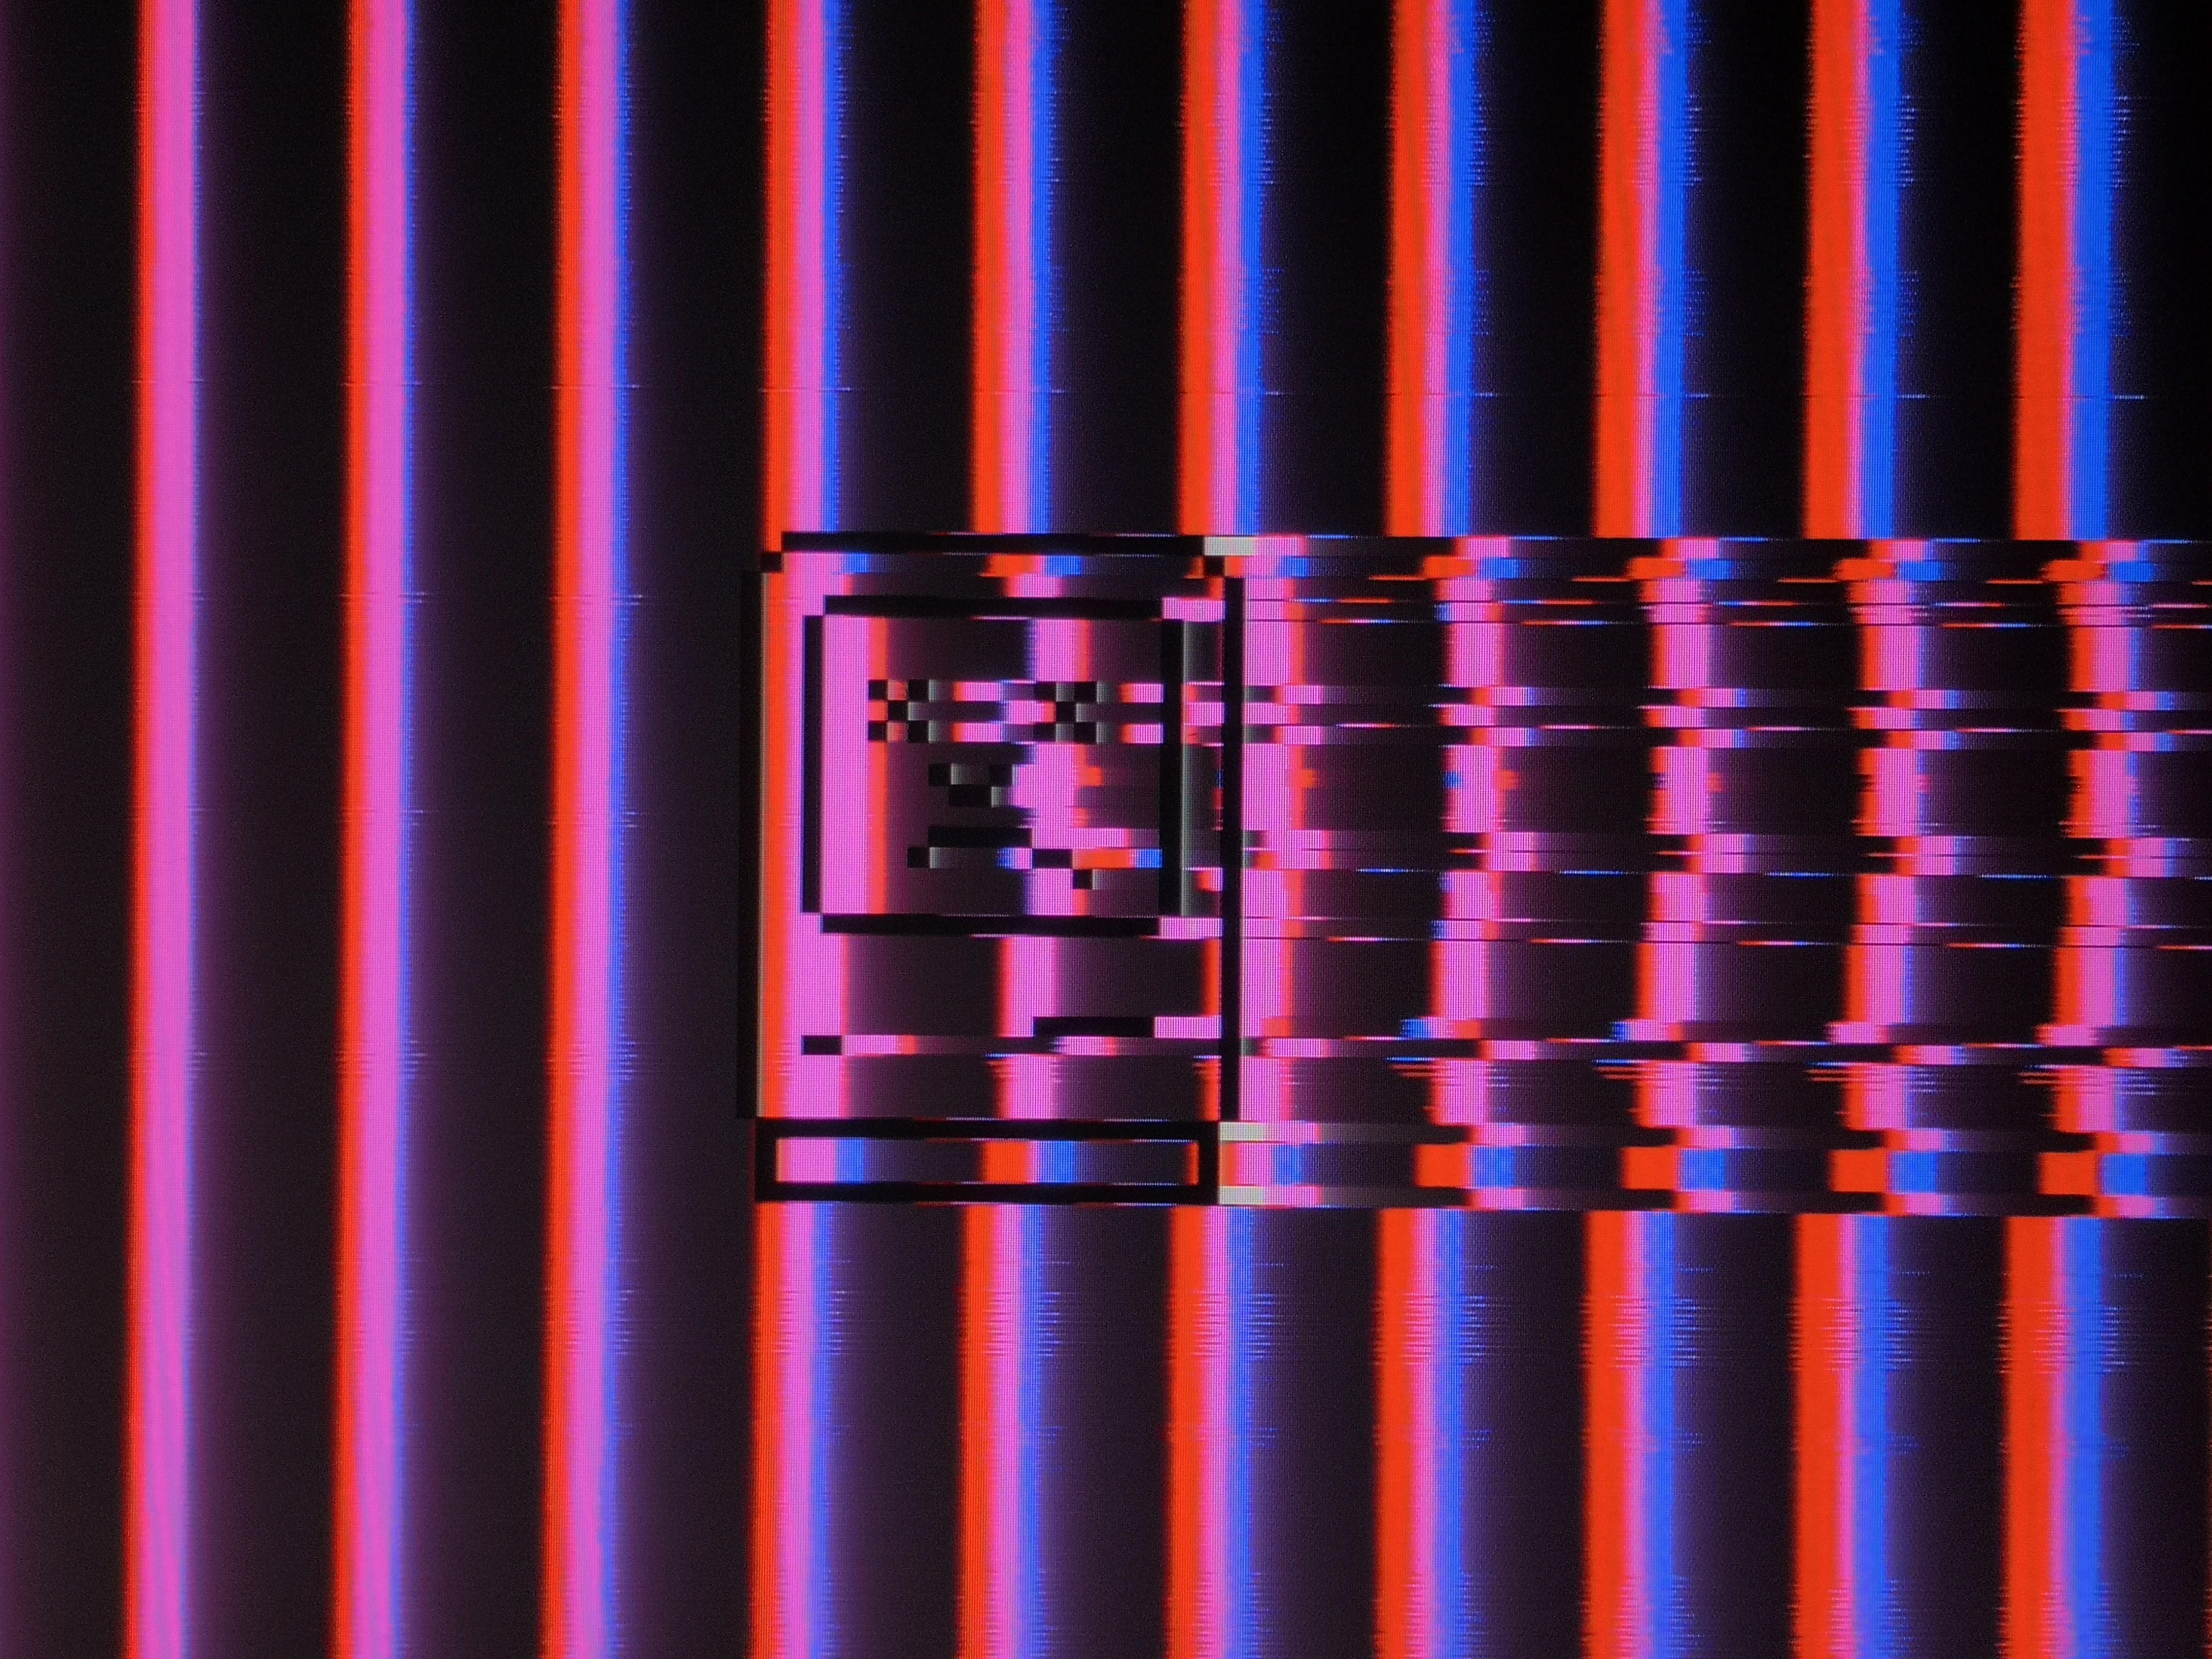 project:videoglitcharray:img_20190831_180857.jpg